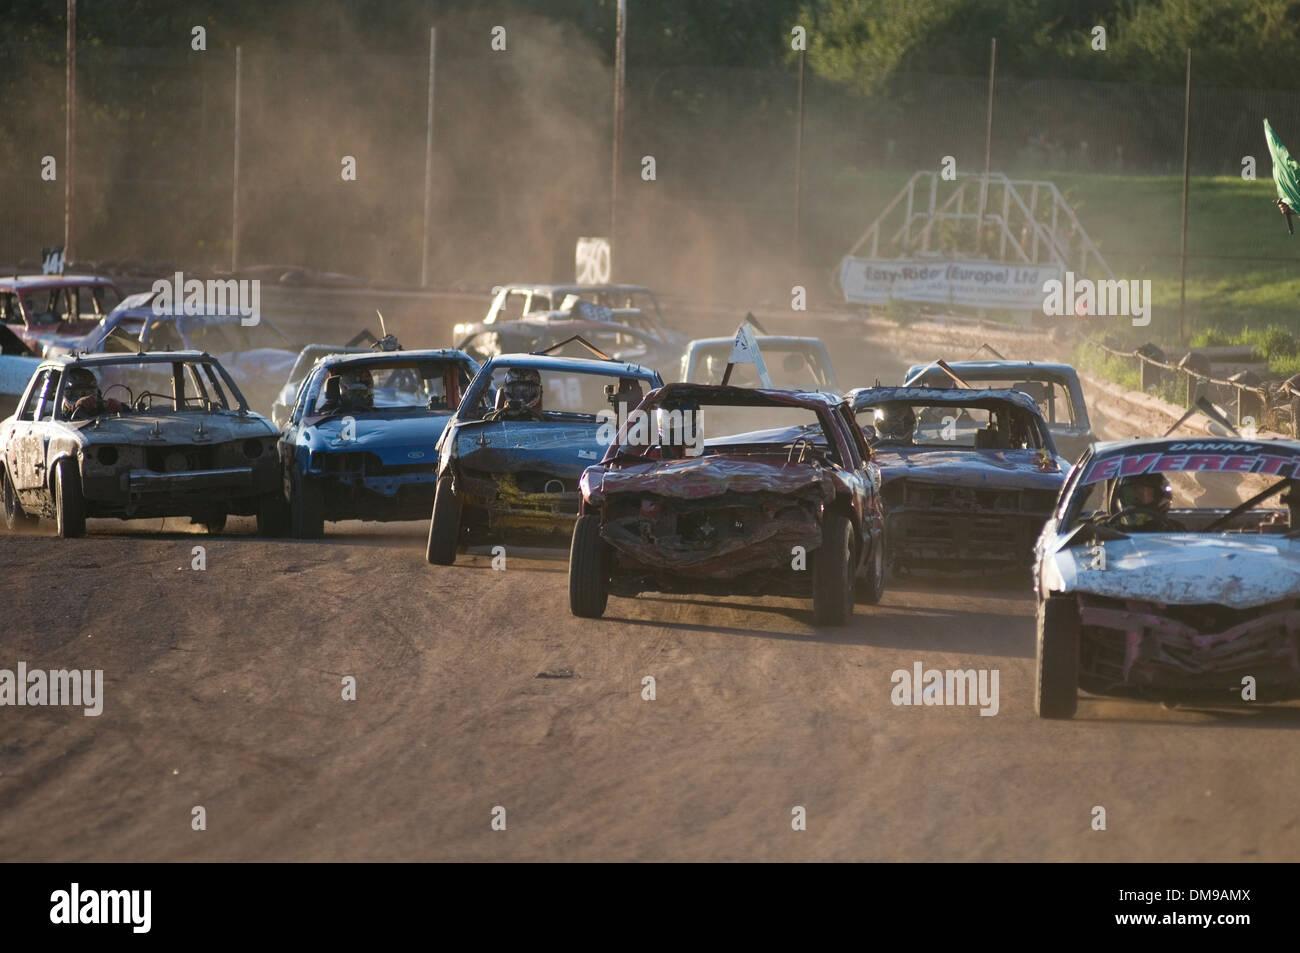 stock car cars racing race races banger bangers old junk scrap ...